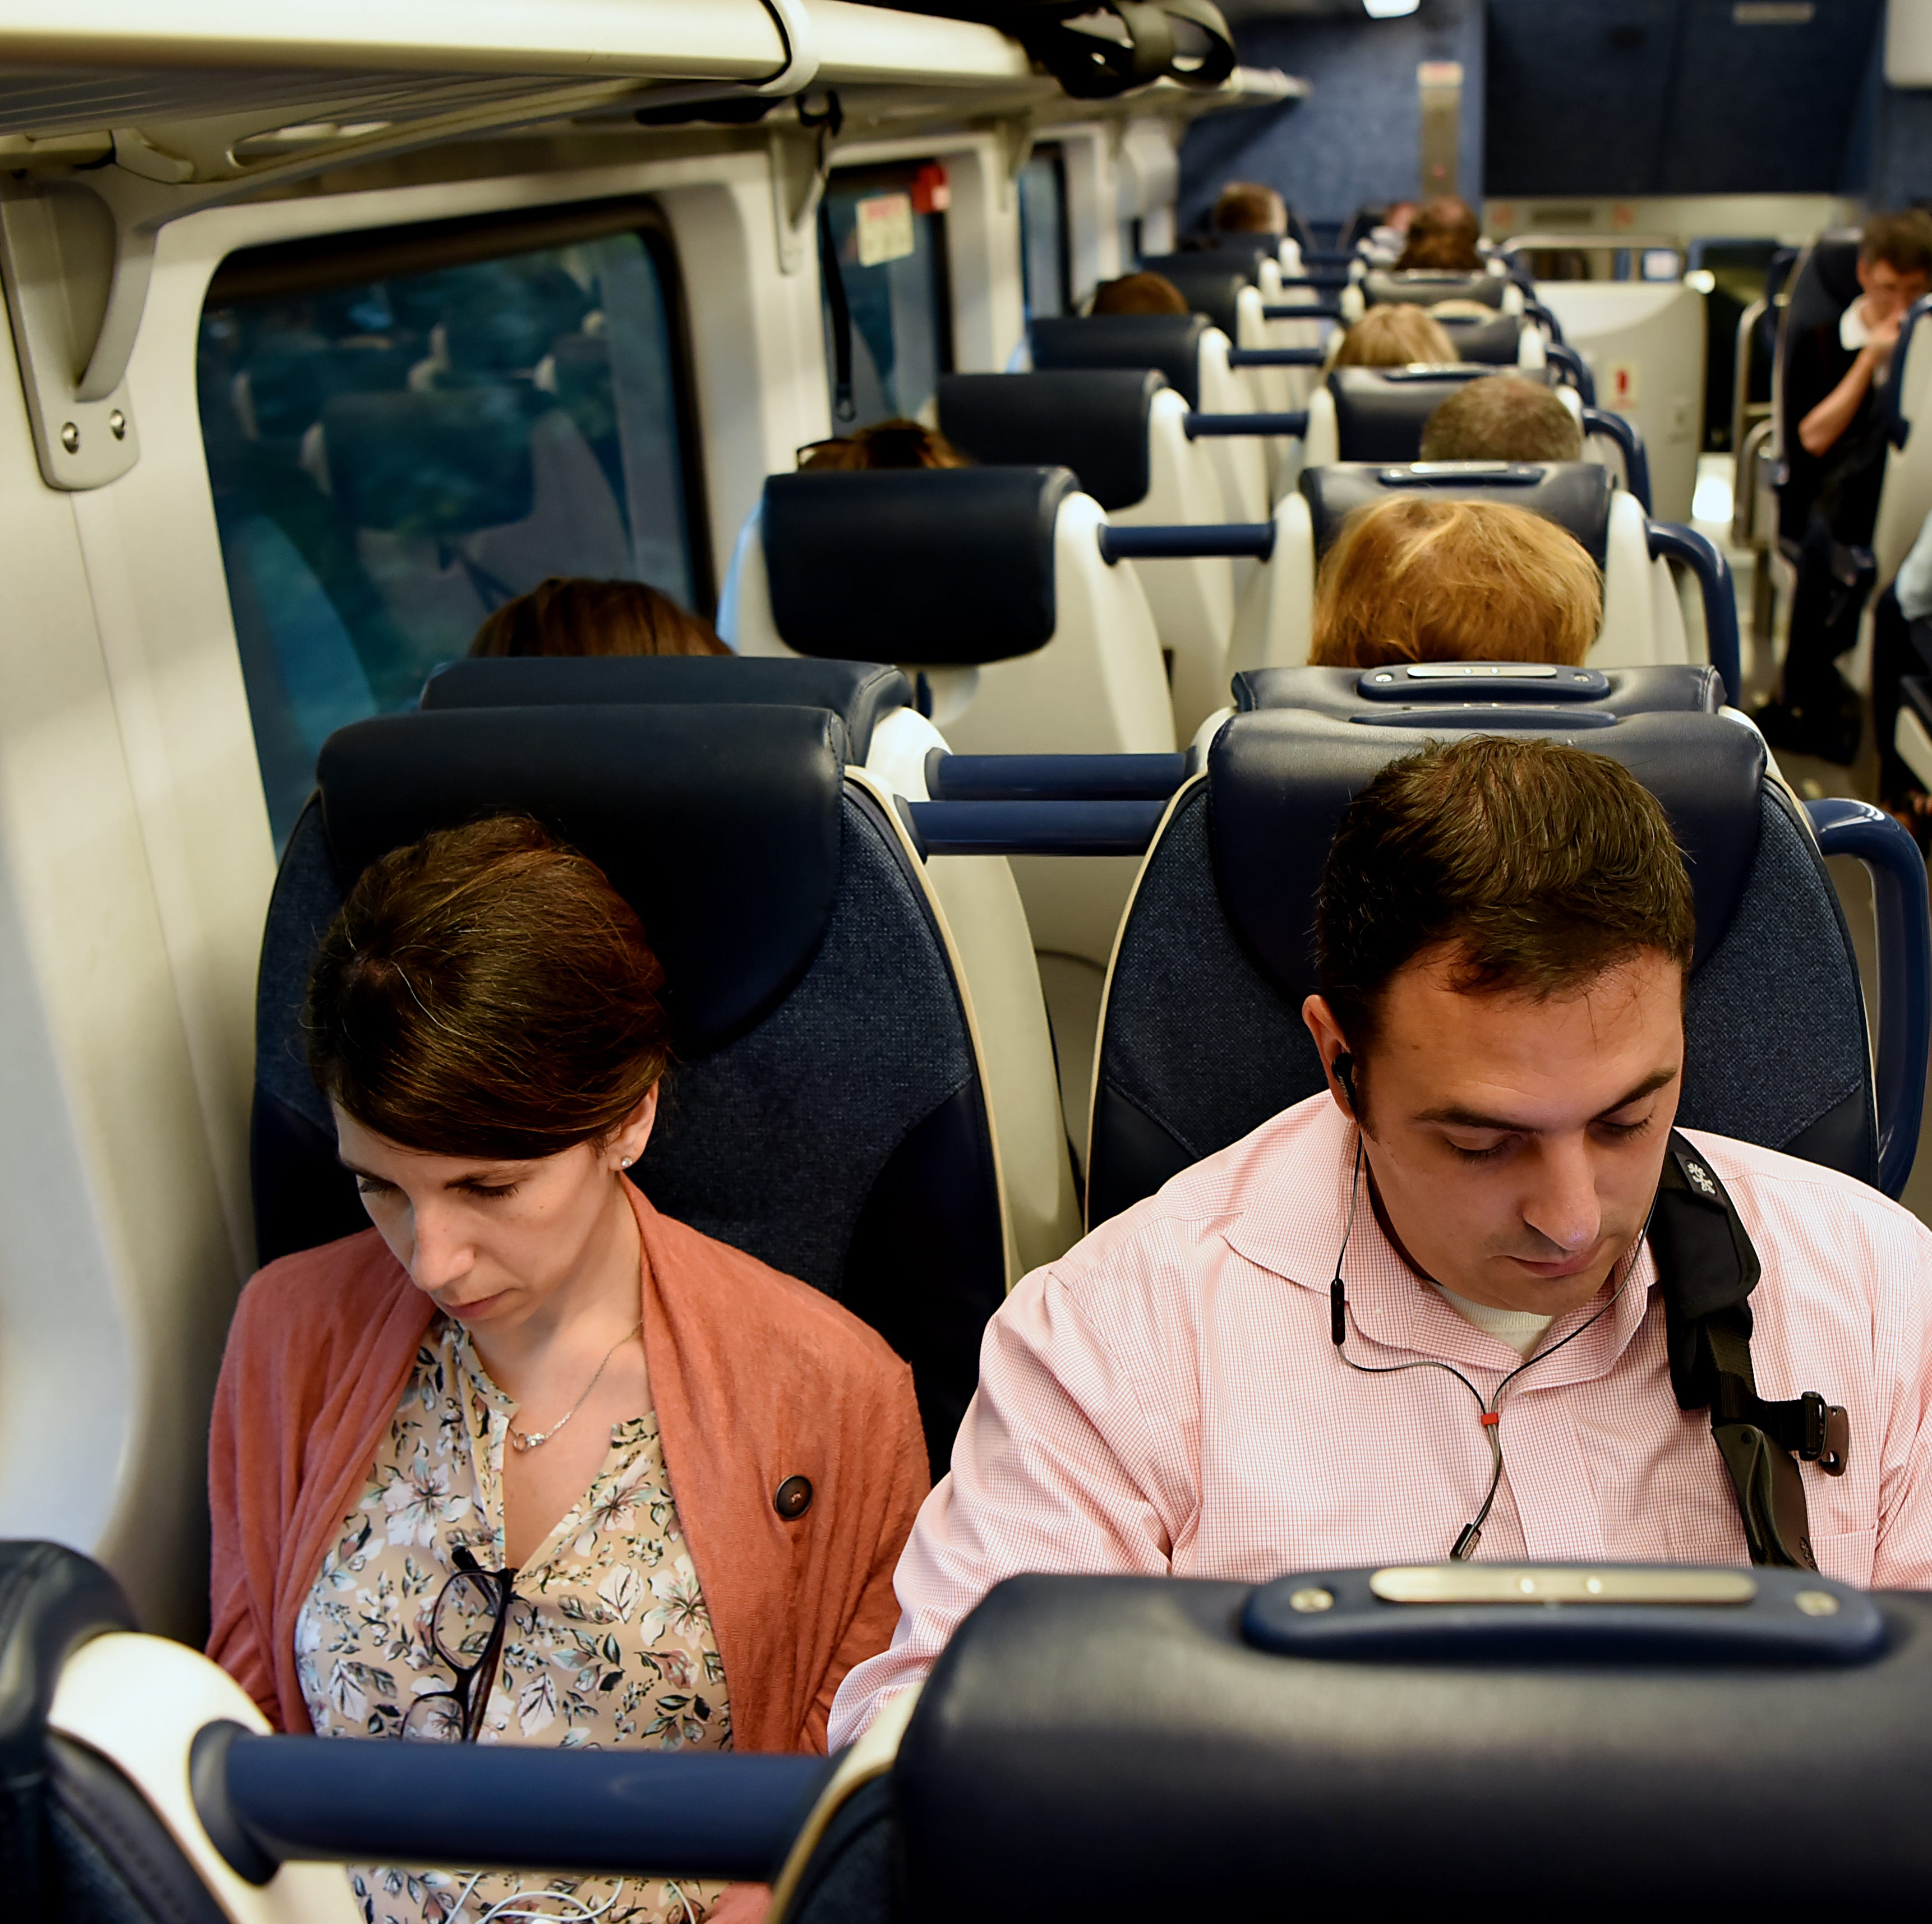 NJ Transit: Trains have minor delays across several lines